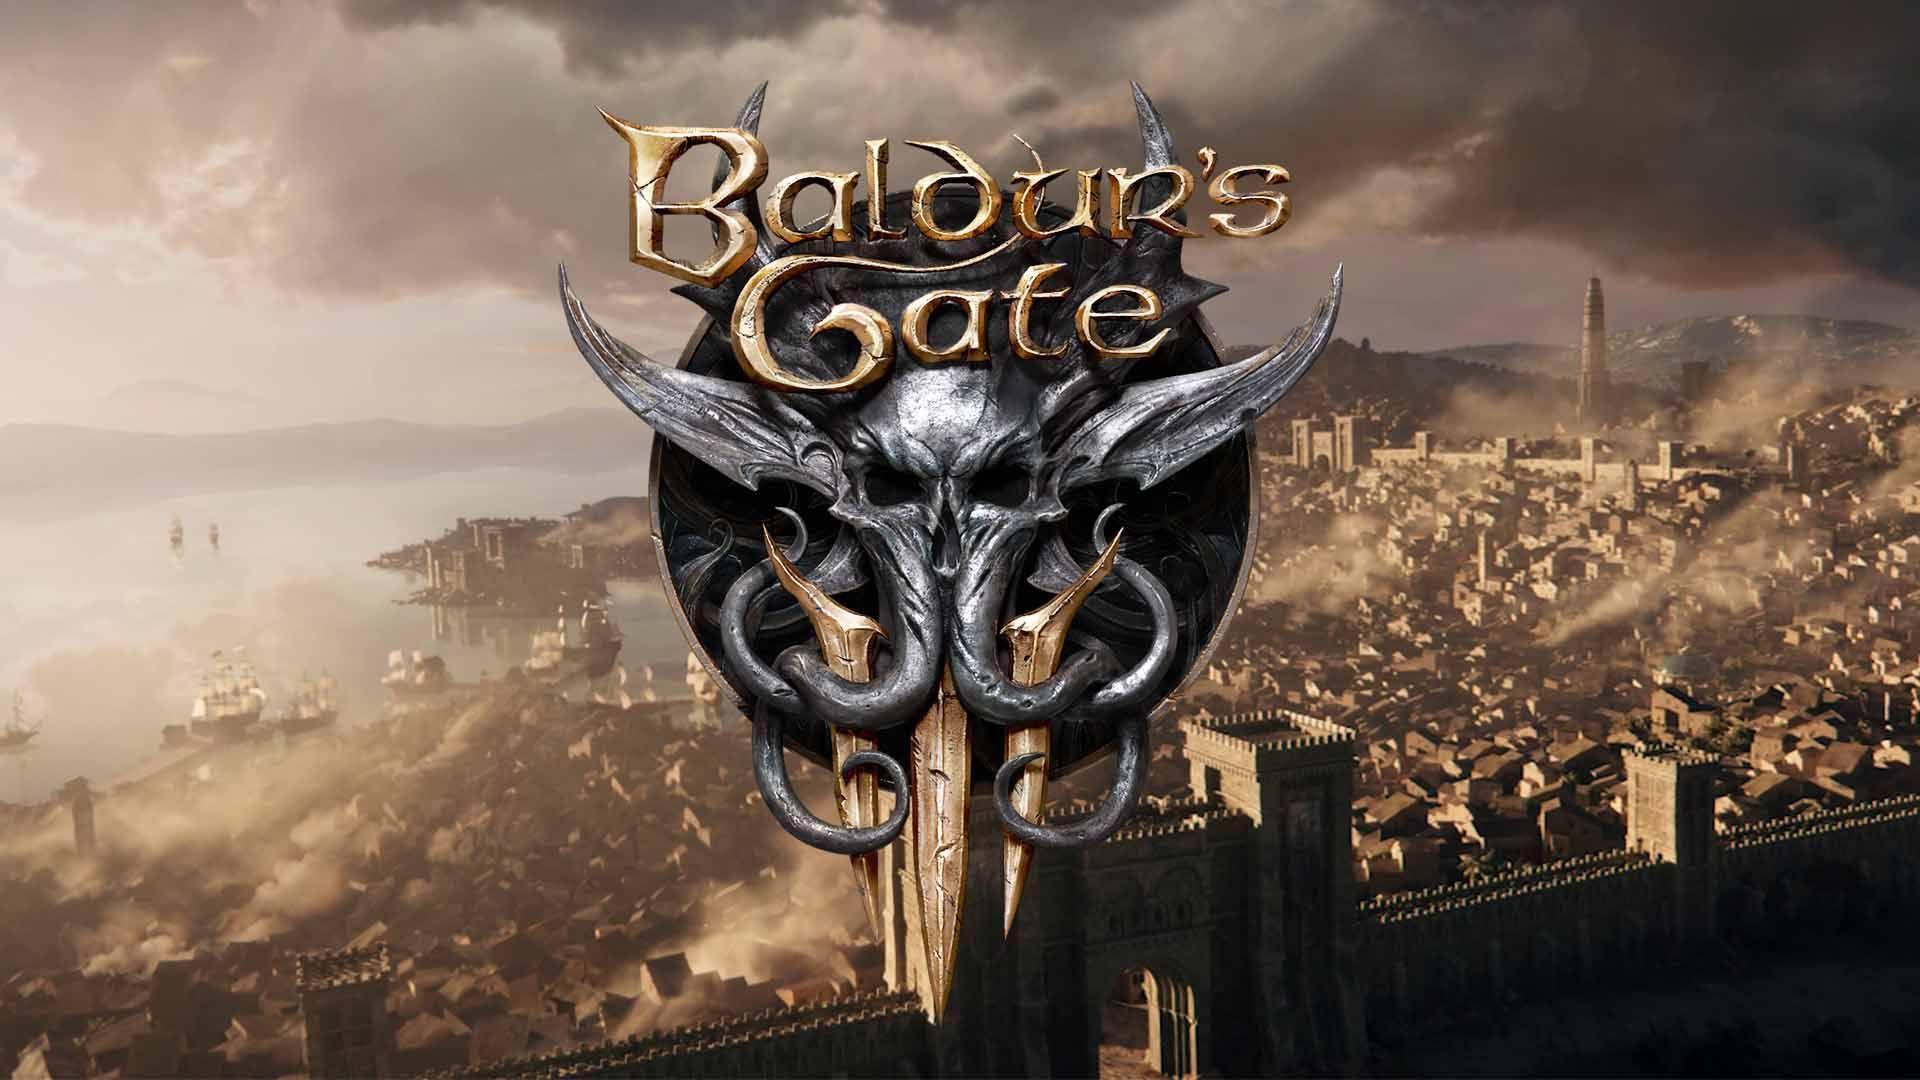 Baldurs-Gate 3-provato-early-access